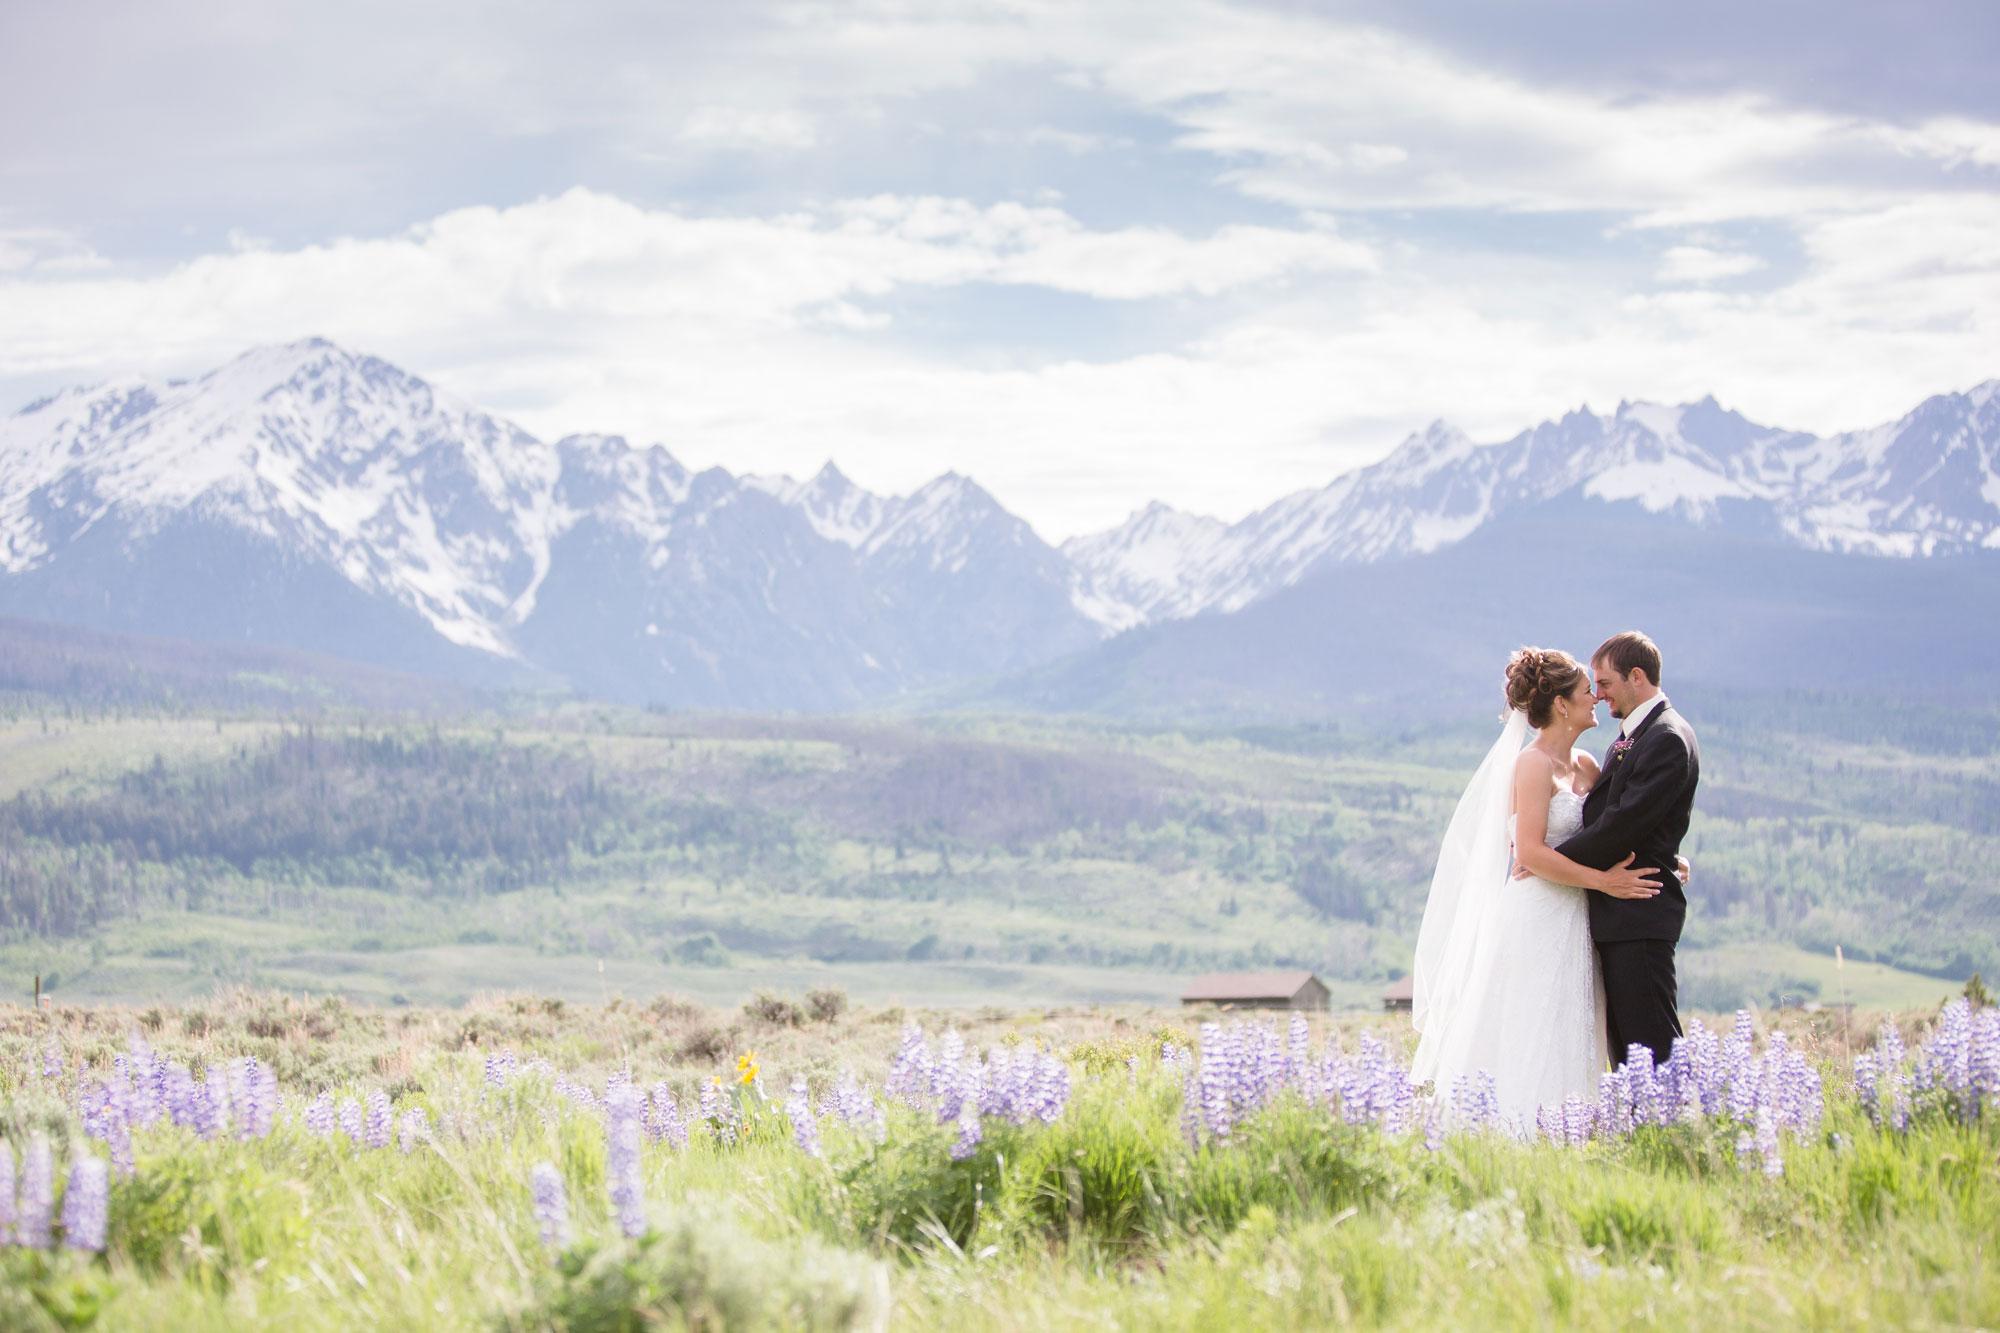 Sam & Kyle's Wedding at the Silverthorne Pavilion, Colorado